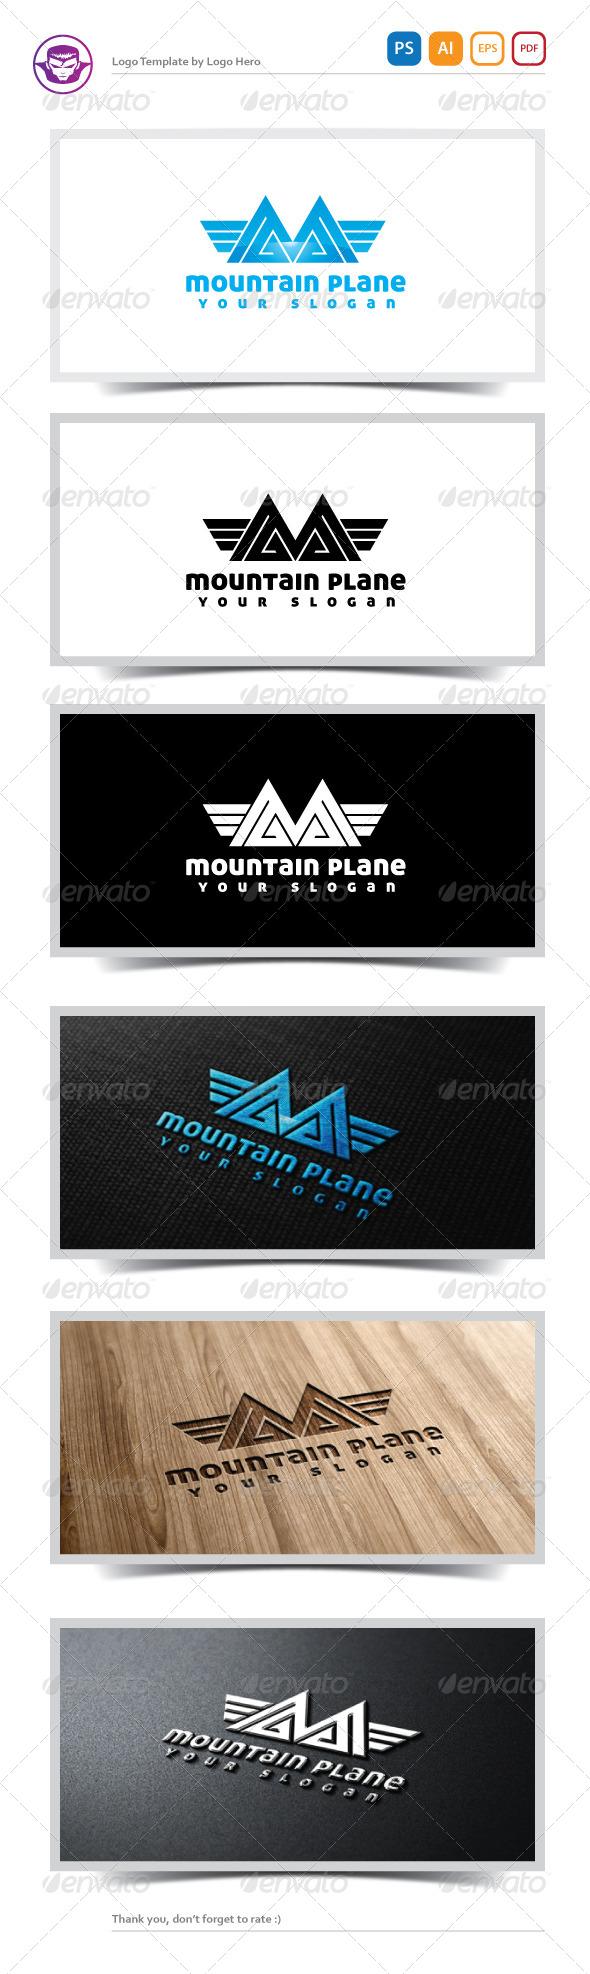 GraphicRiver Mountain Plane Logo Template 5166928